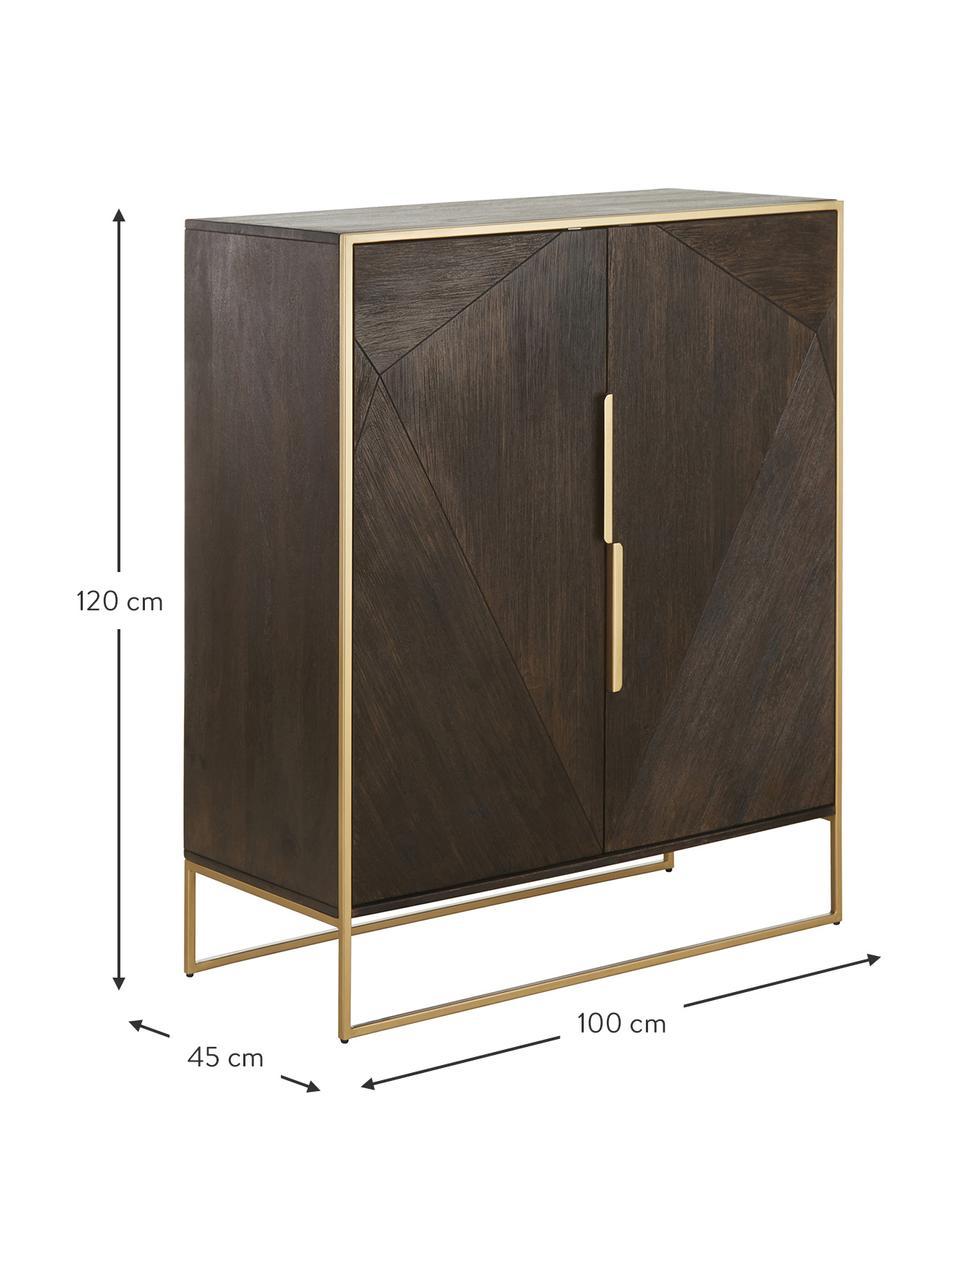 Highboard Harry aus massiven Mangoholz, Korpus: Massives Mangoholz, lacki, Mangoholz, Goldfarben, 100 x 120 cm